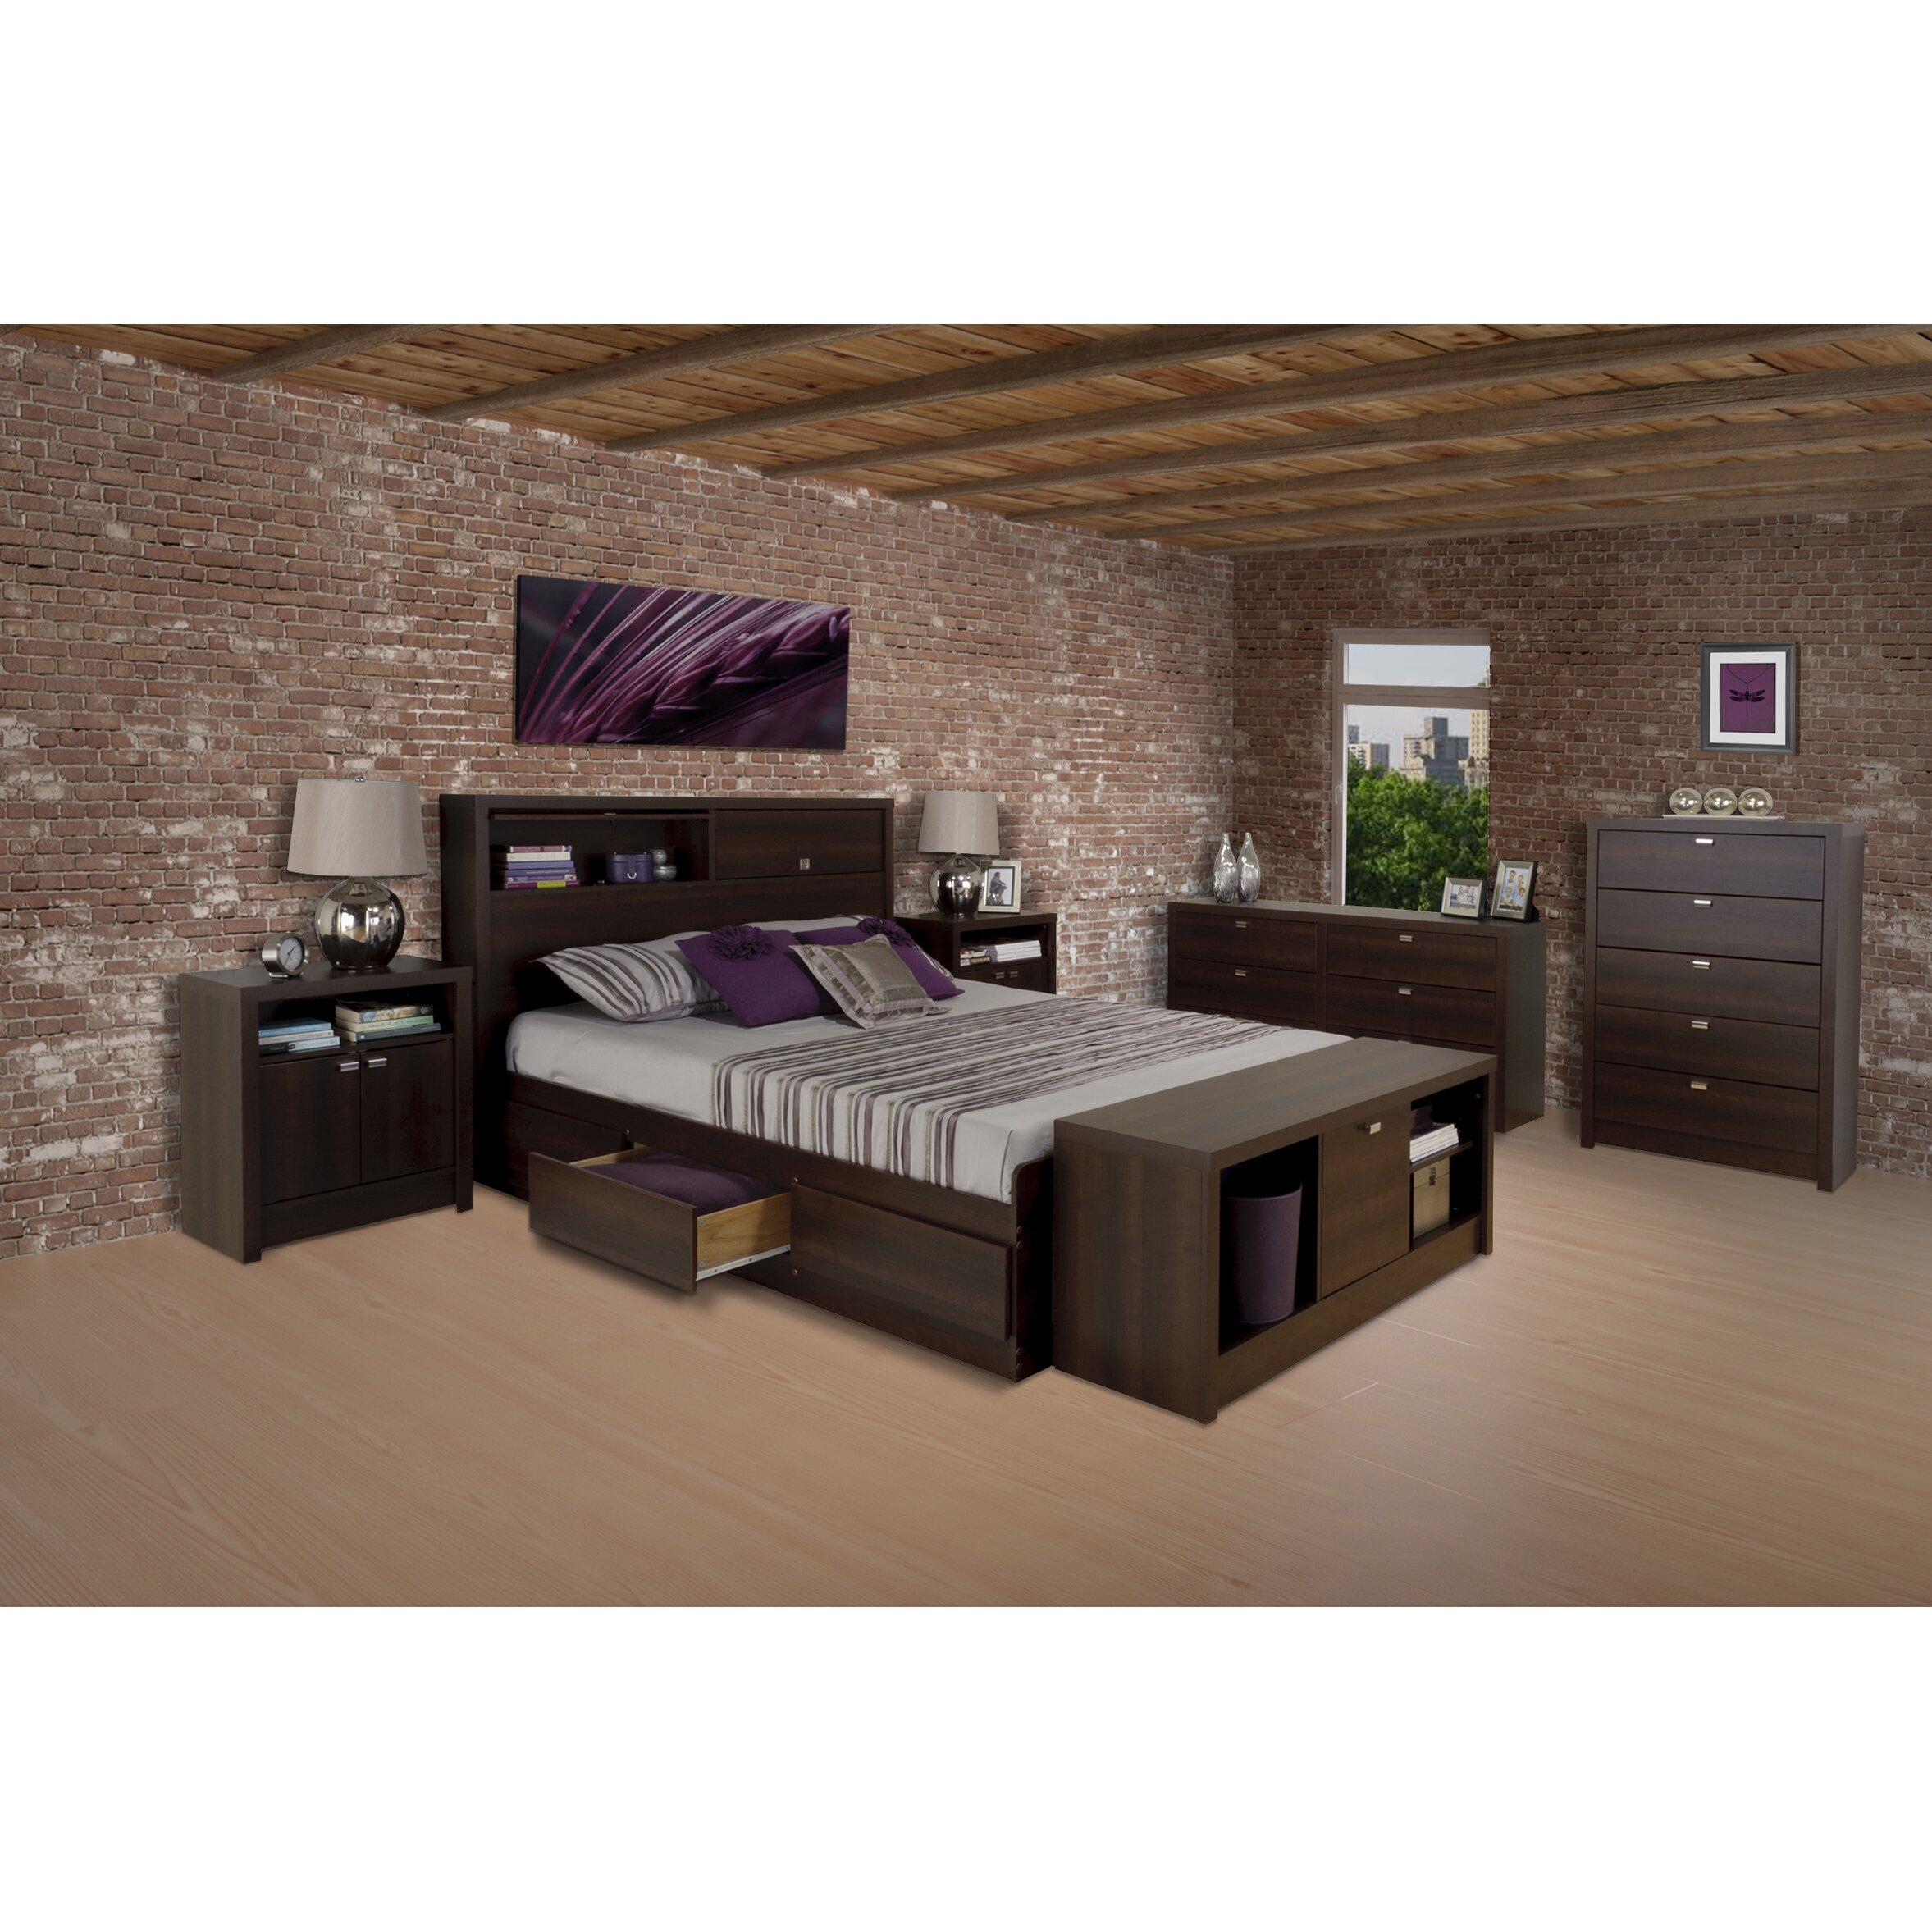 28 espresso king bedroom set all products bedroom bedroom f